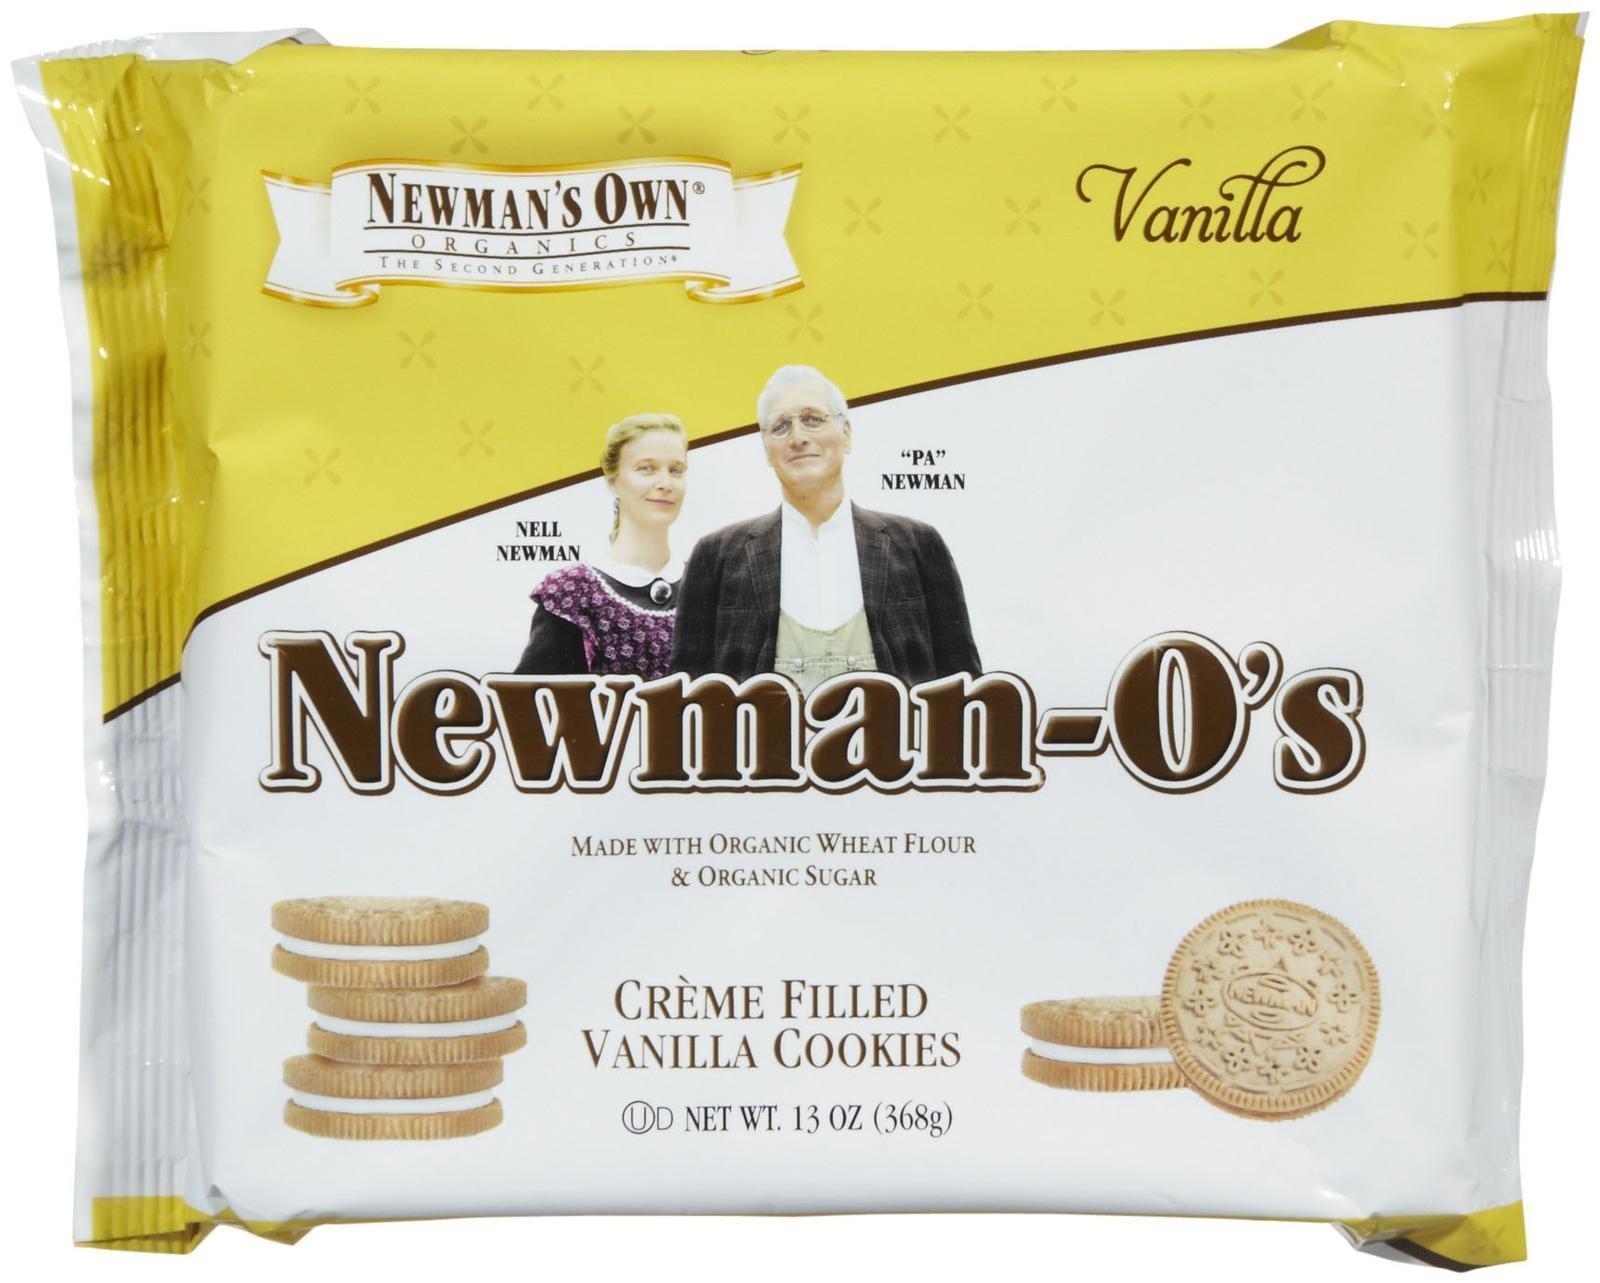 Newman's Own Organics Newman-O's Vanilla Creme Filled Vanilla Cookies